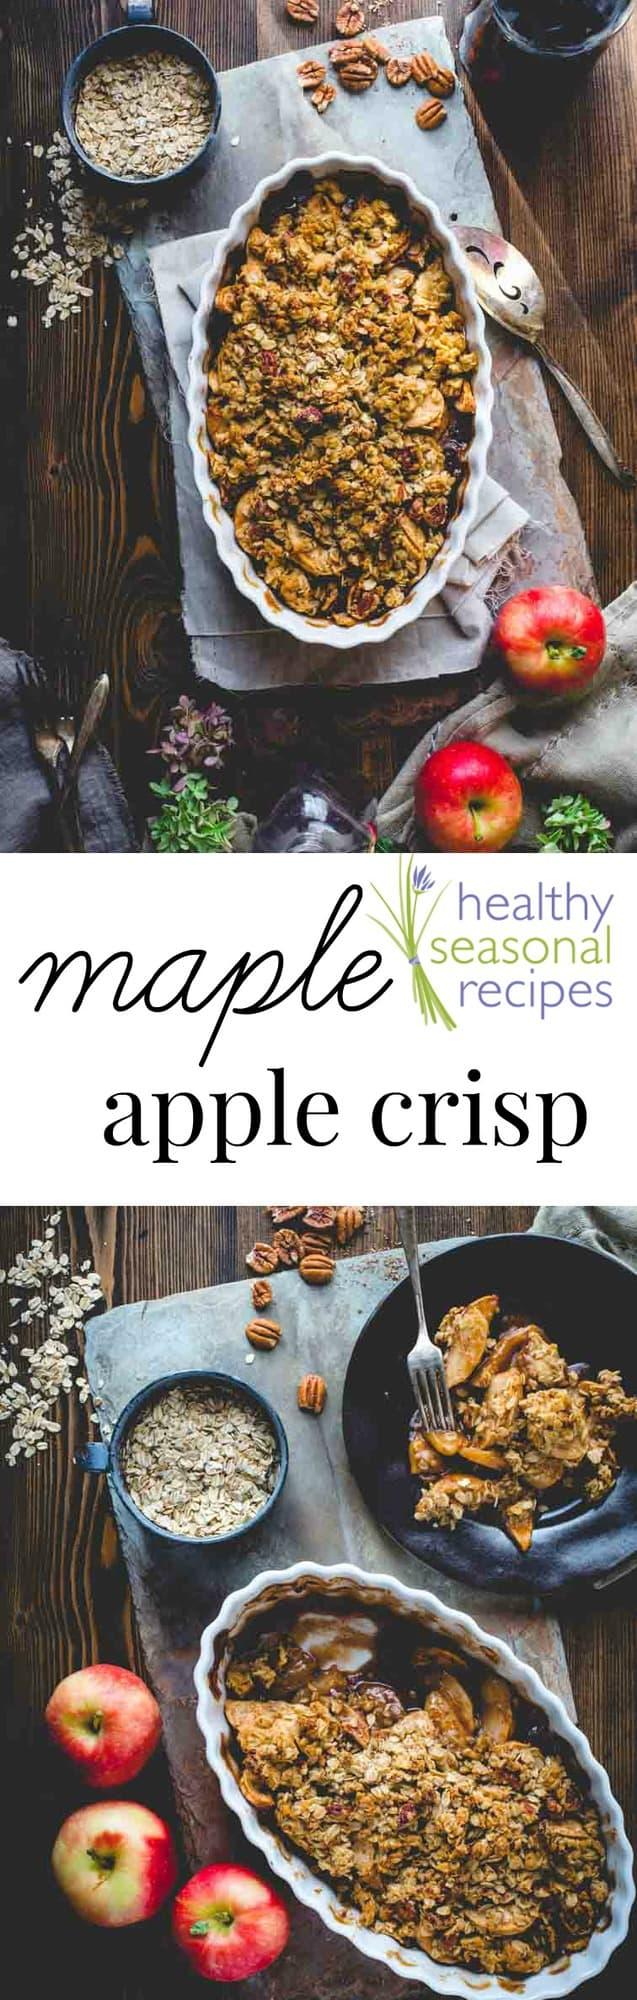 related posts gluten free maple peach blueberry crisp low sugar